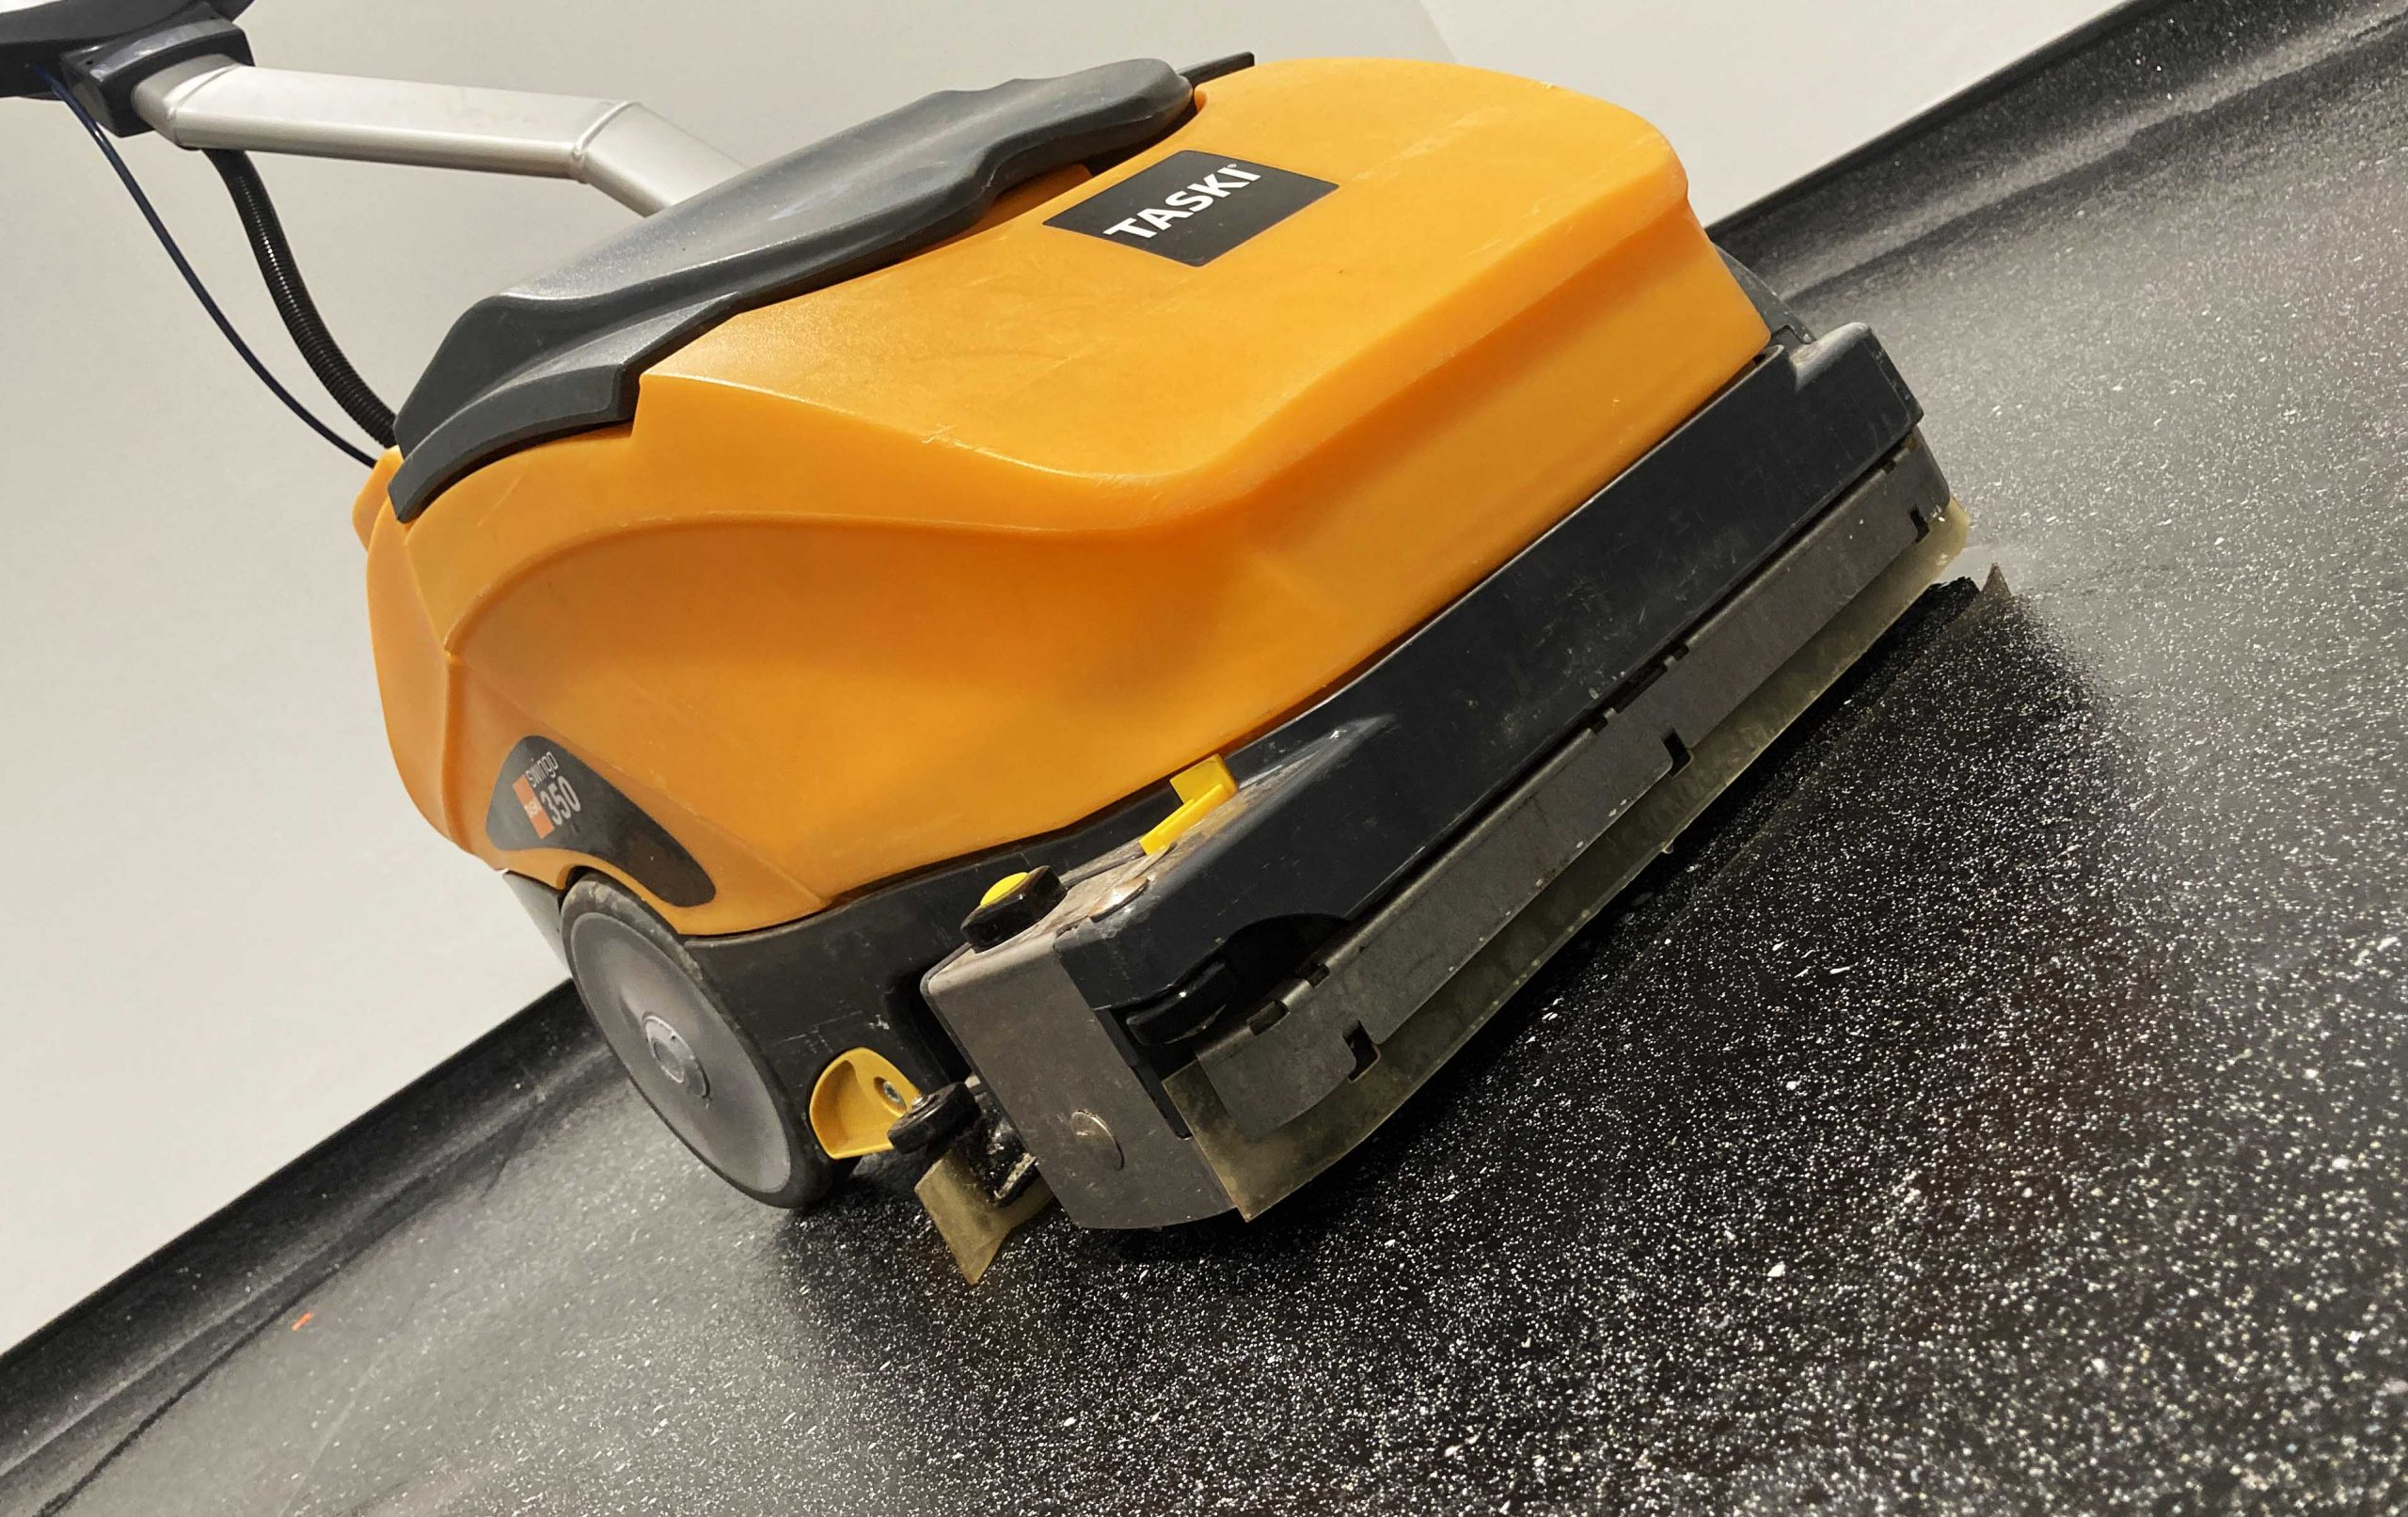 hard floor cleaning taski scrubber